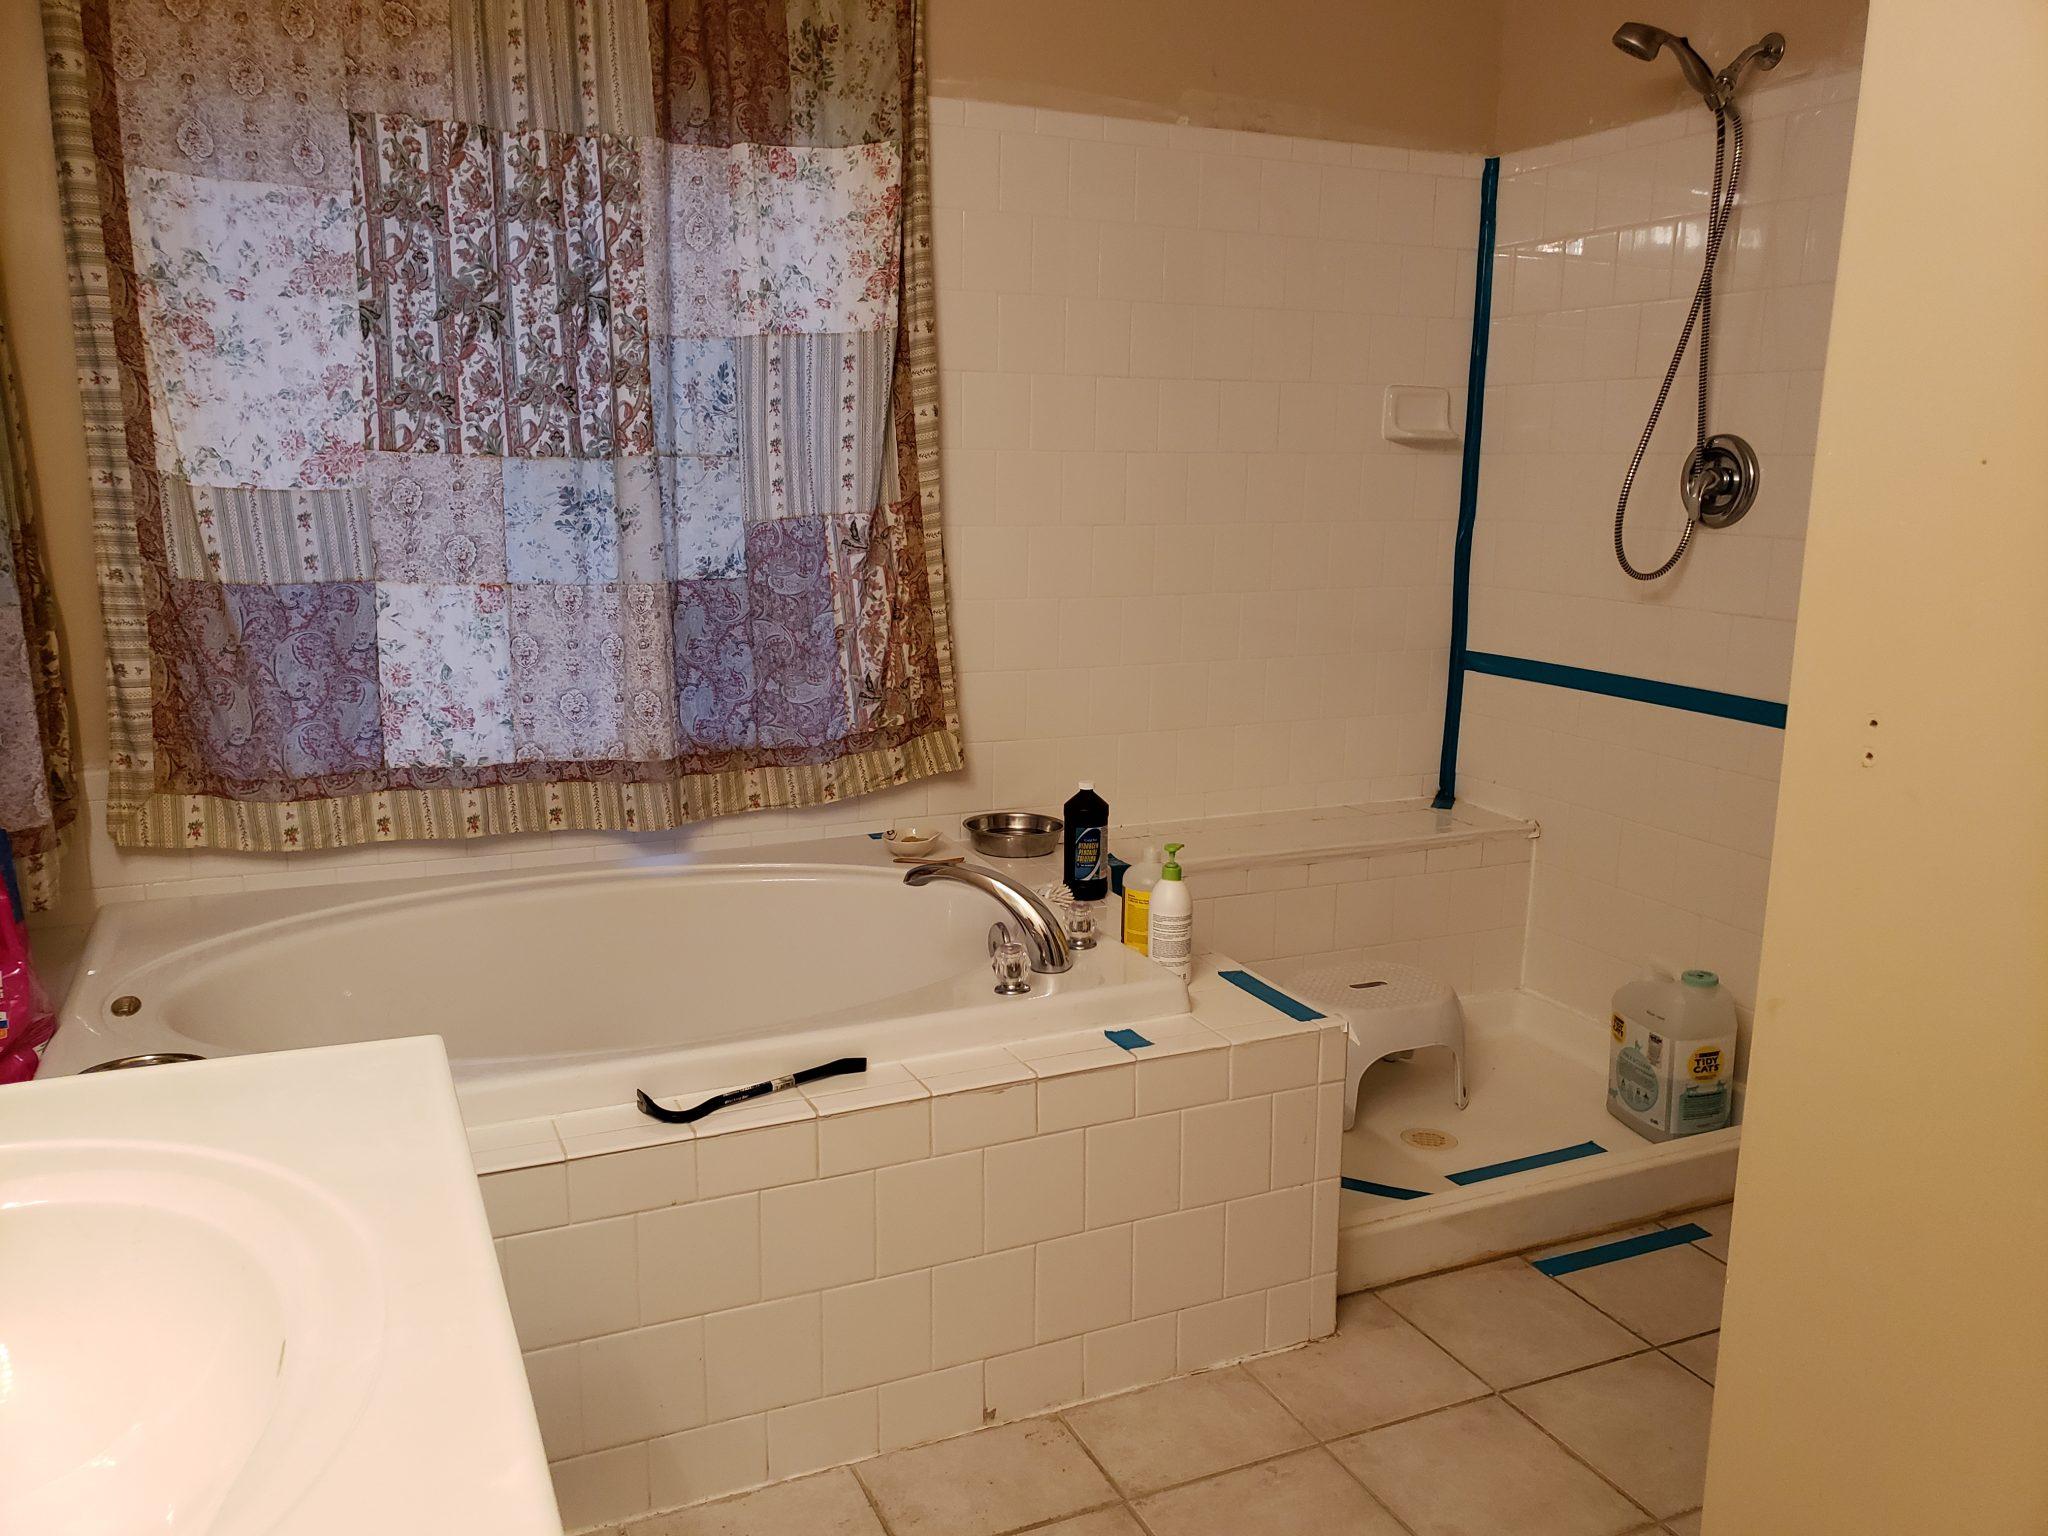 DIY Bathroom Remodel - GreensNGoodness.com